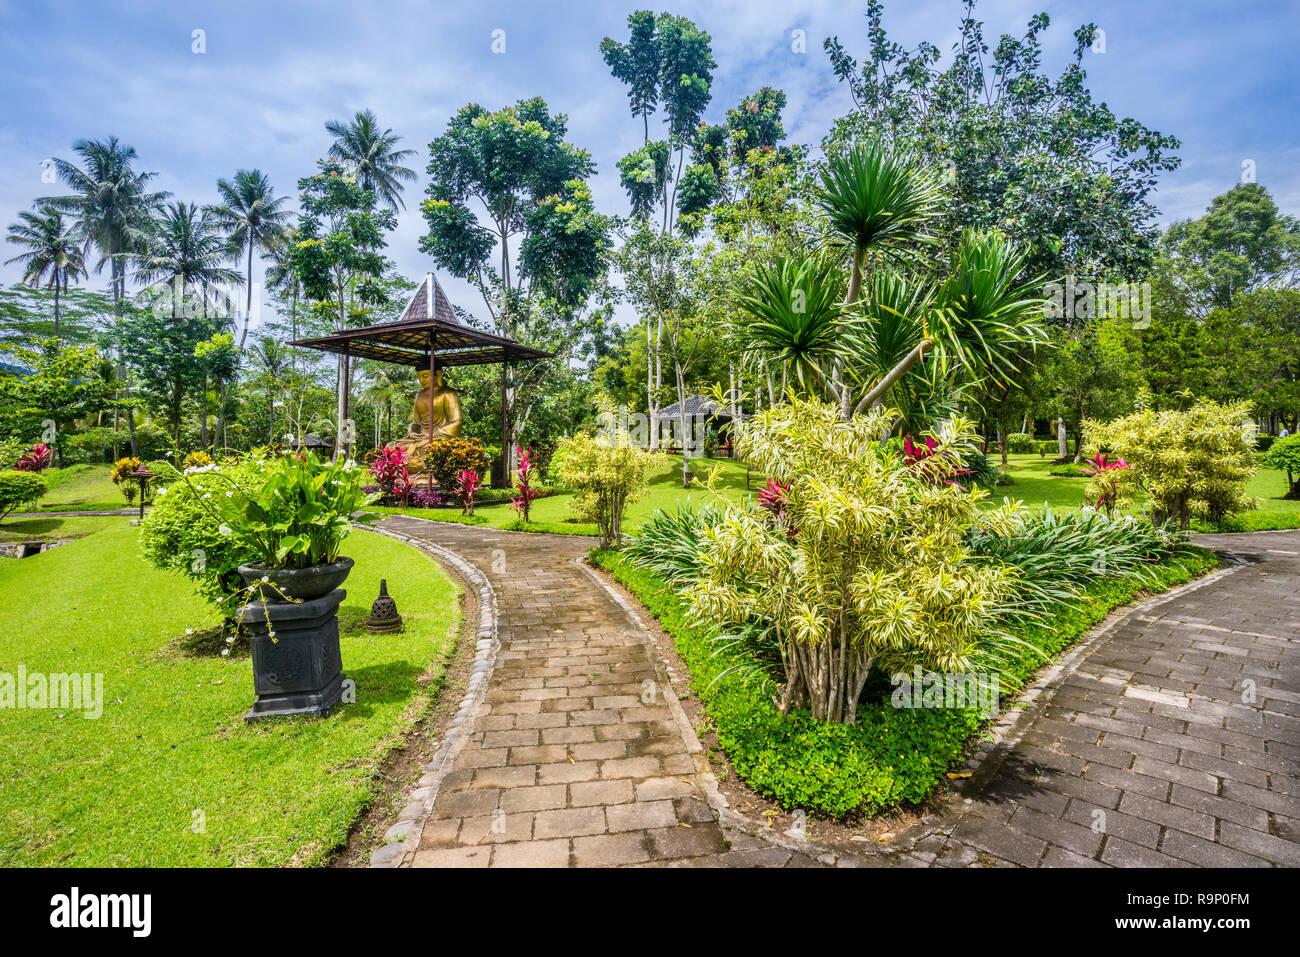 landscaped gardens of the Manohara Resort at the Borobudur archeological park, Borobudur, Central Java, Indonesia - Stock Image